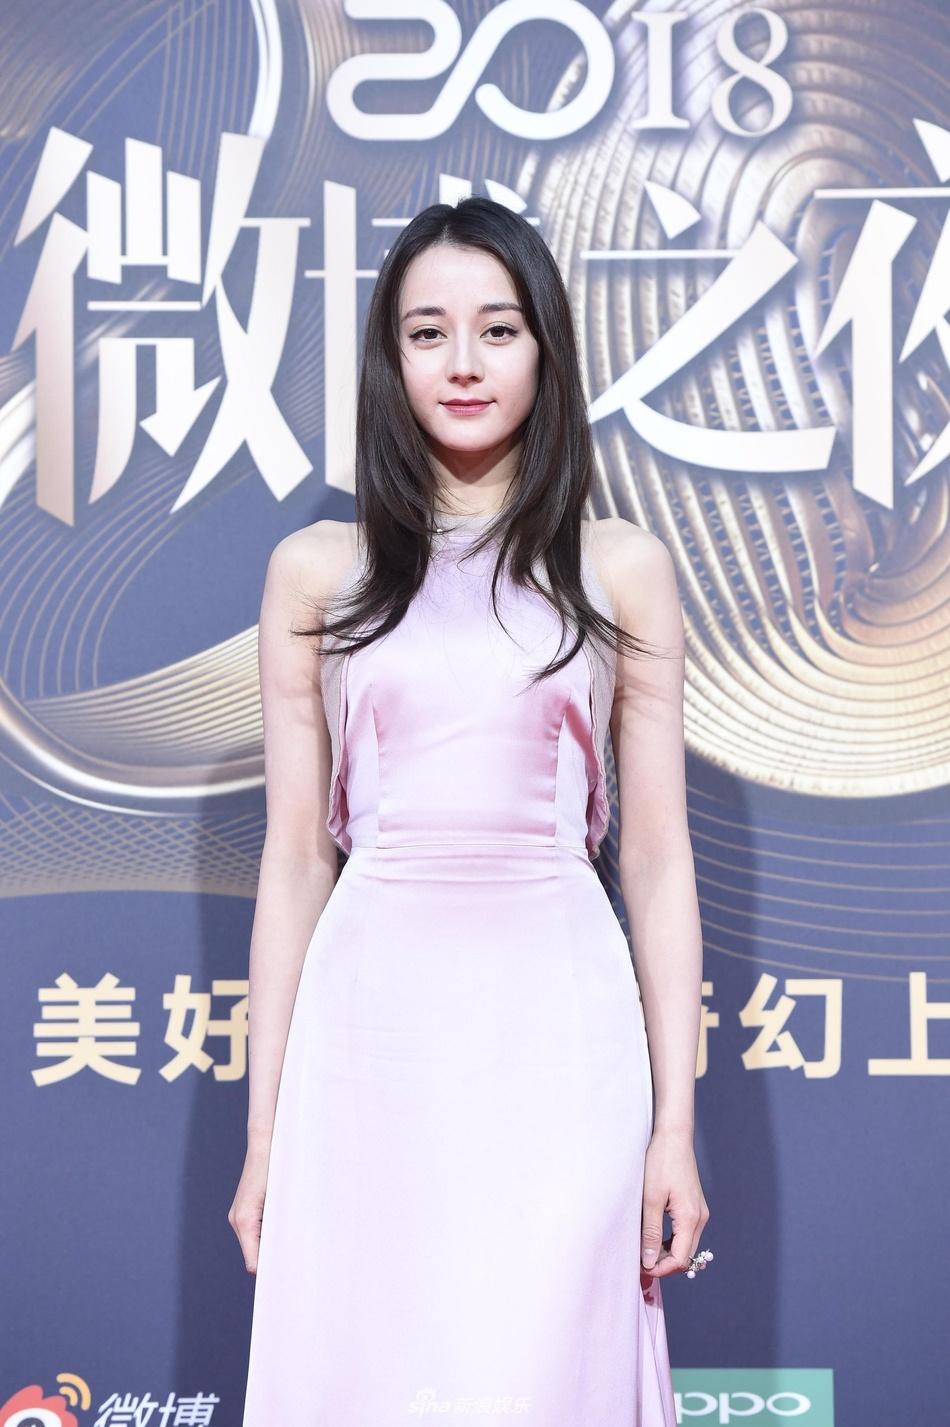 Dich Le Nhiet Ba xinh dep, Lam Chi Linh goi cam tren tham do hinh anh 2